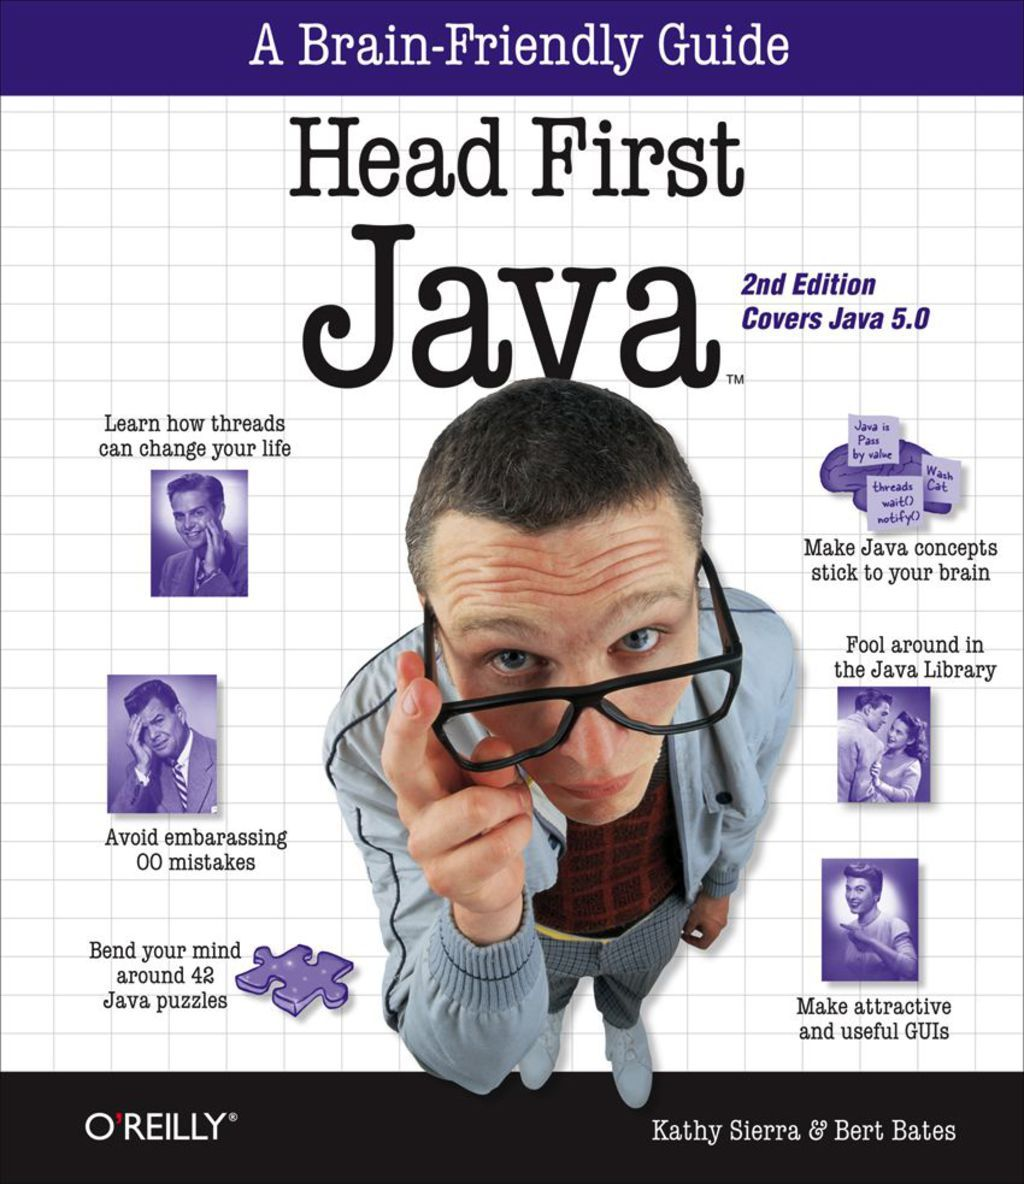 Head First Java Ebook Computer Programming Languages Good